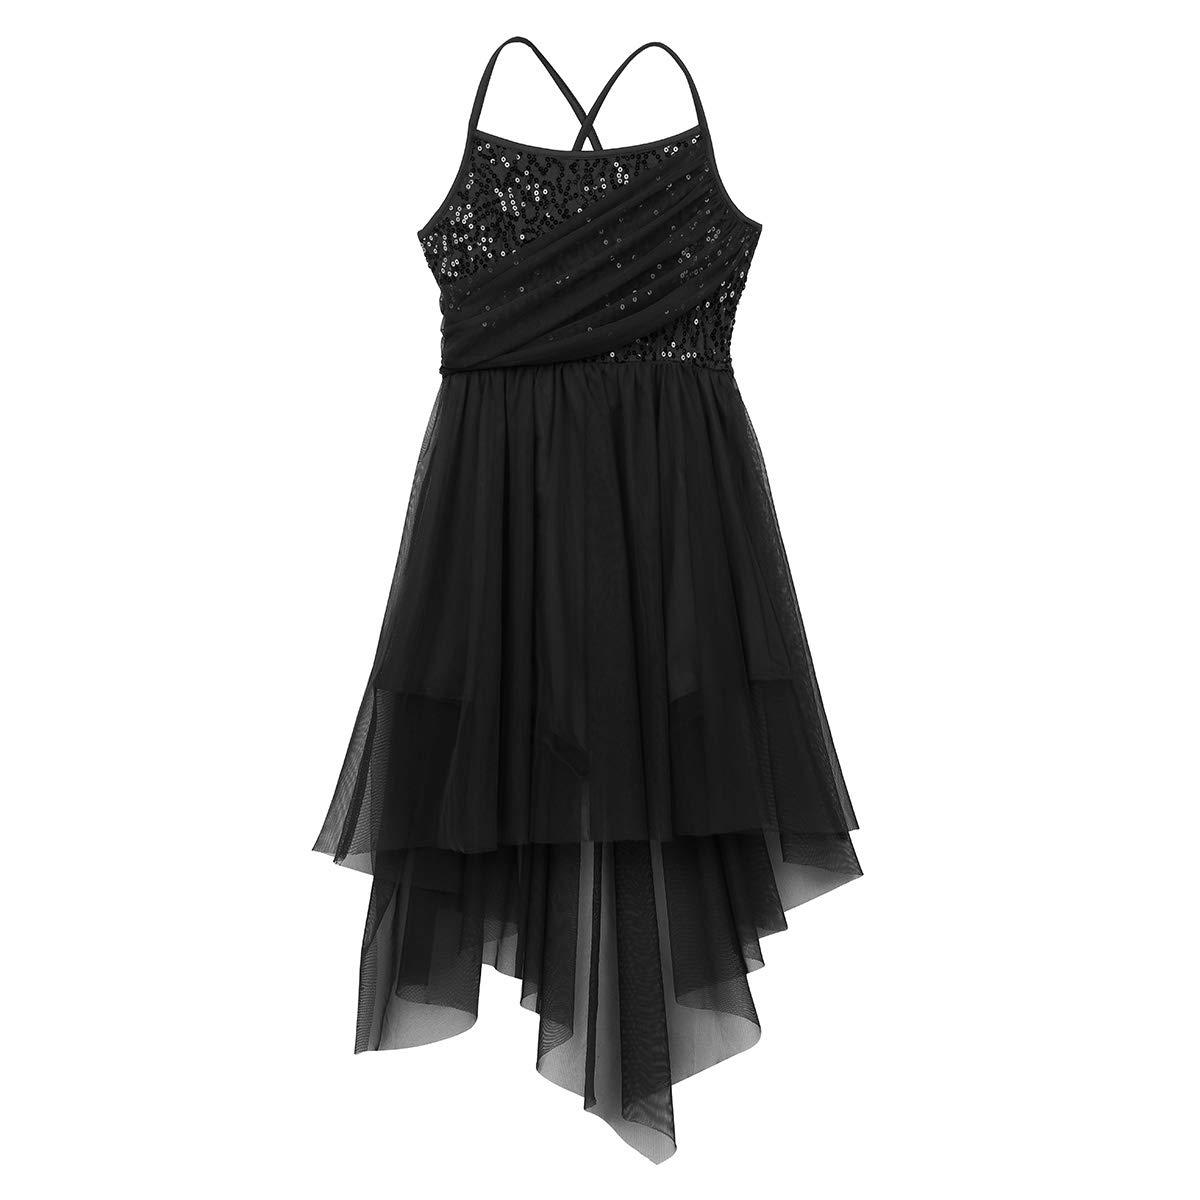 YOOJIA Vestido de Danza Latina Se/ñora Chica Traje Bailarina Lentejuelas Tango Capa Irregular Rendimiento Dancewear